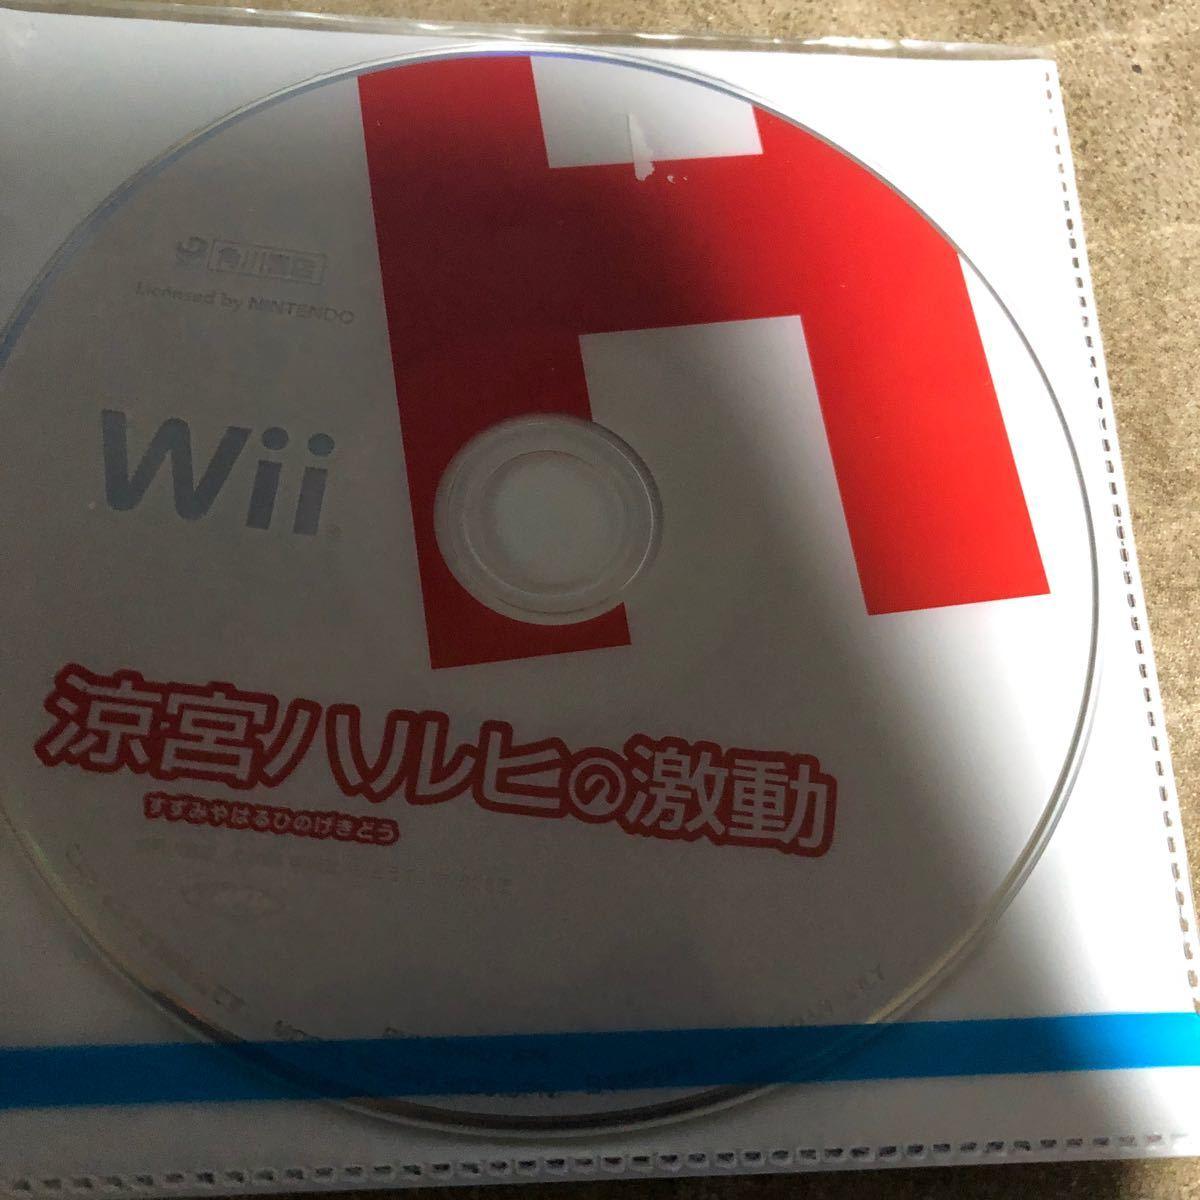 【Wii】 涼宮ハルヒの激動 (通常版)